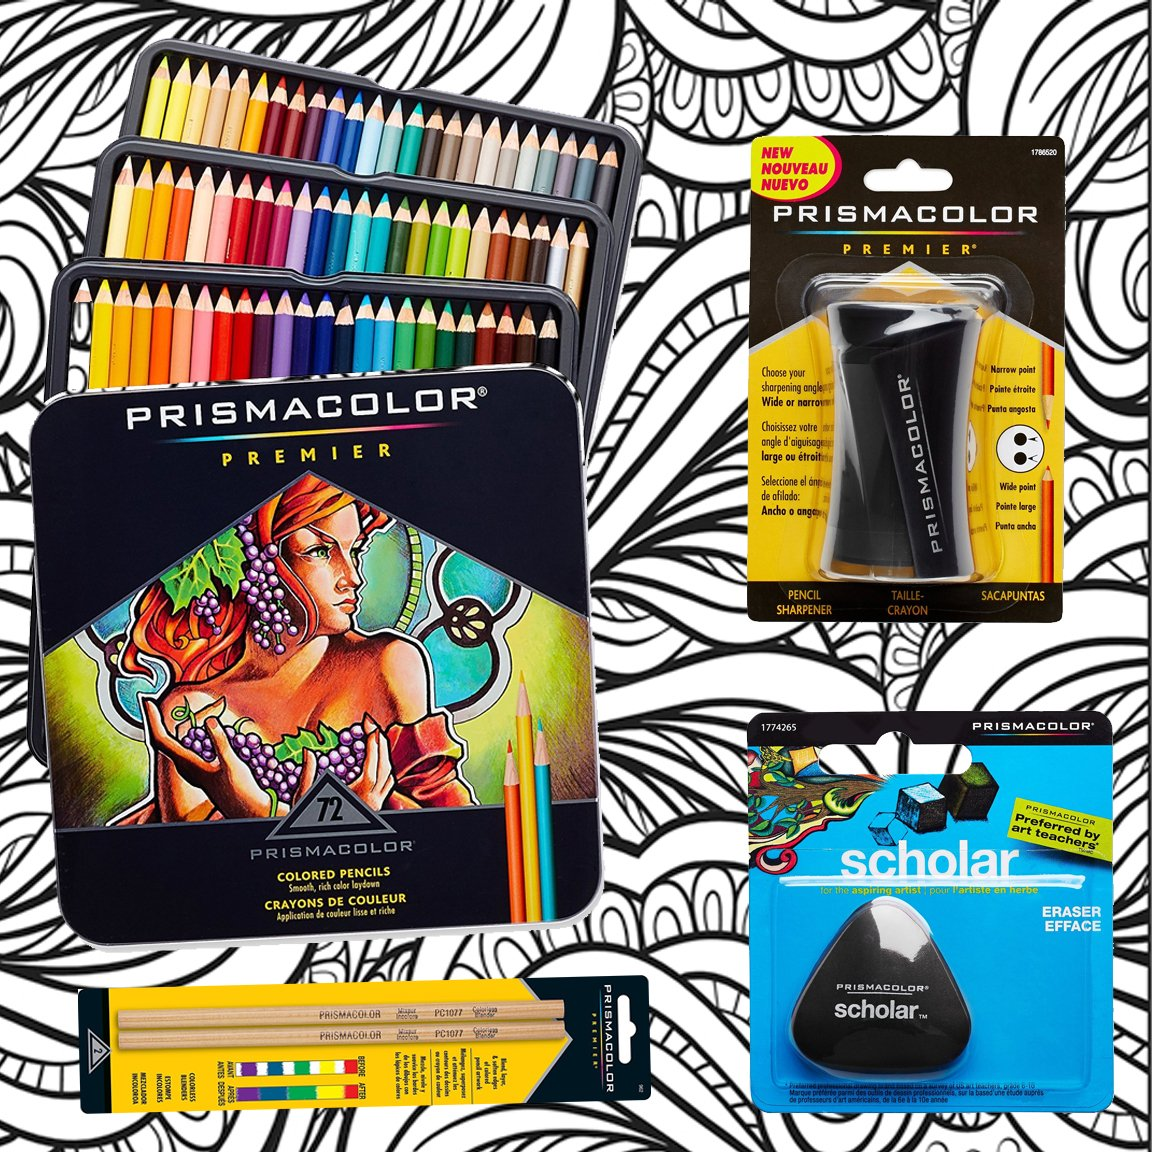 Prismacolor 72-Count Colored Pencils, Triangular Scholar Pencil Eraser, Premier Pencil Sharpener, Colorless Blender Pencils, and CSS Adult Coloring Book